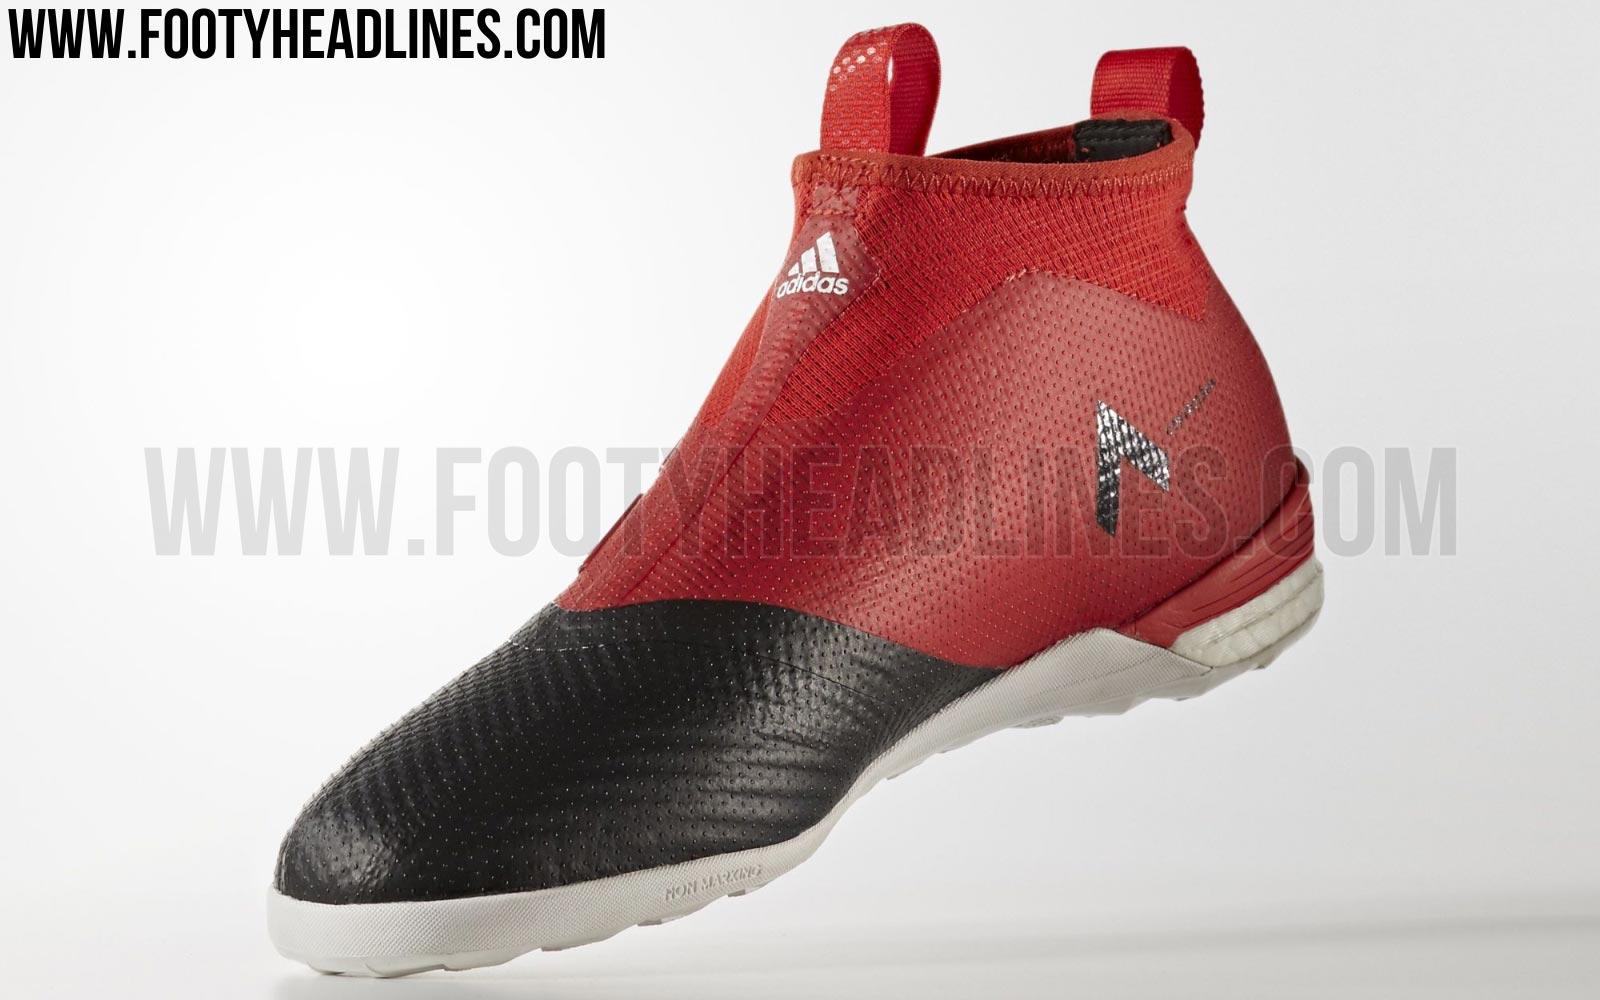 adidas ace tango 17 purecontrol indoor turf boots